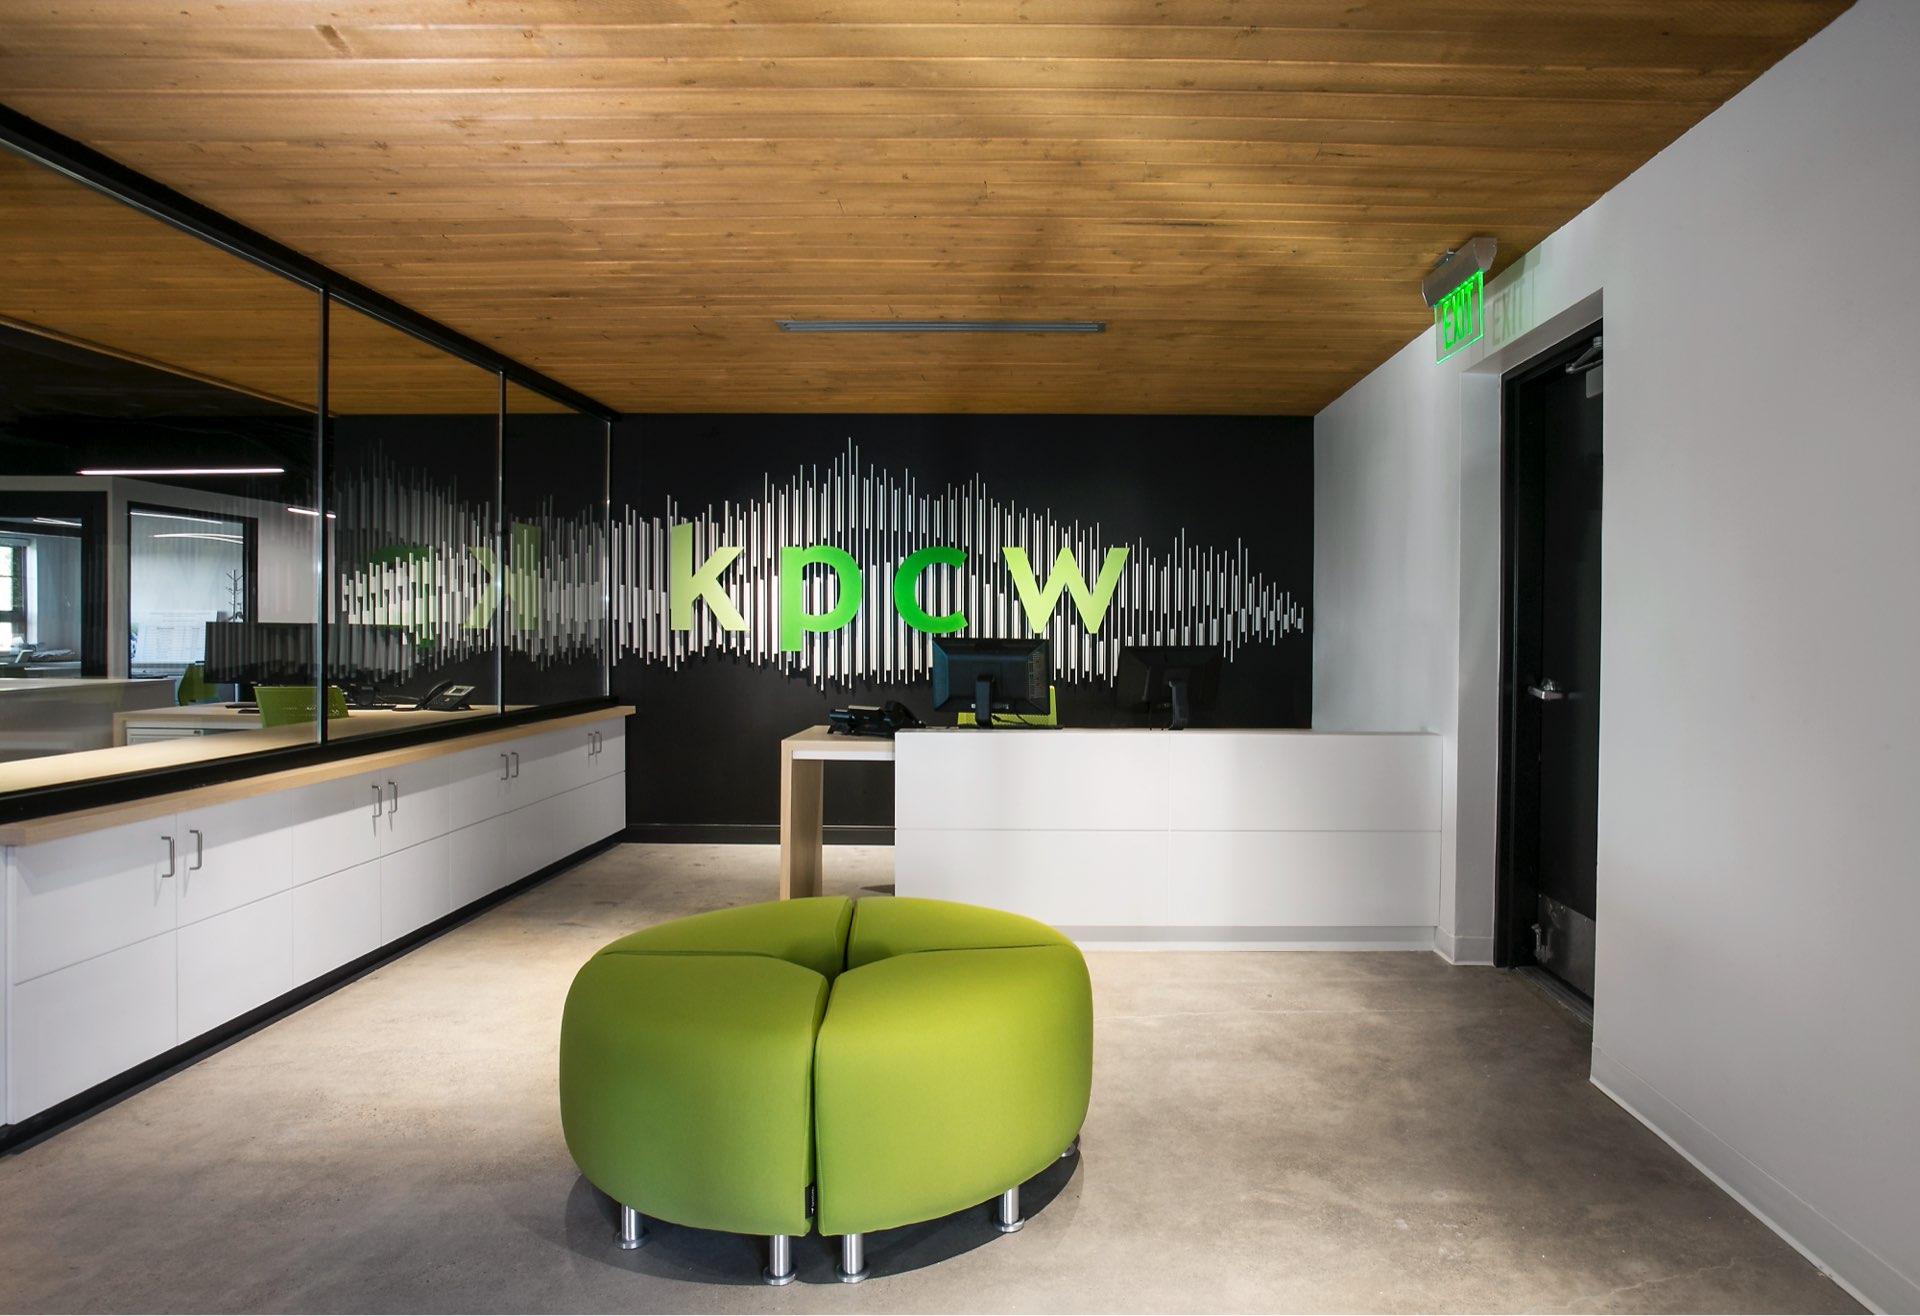 Lobby, KPCW Radio, architectural design by Elliott Workgroup